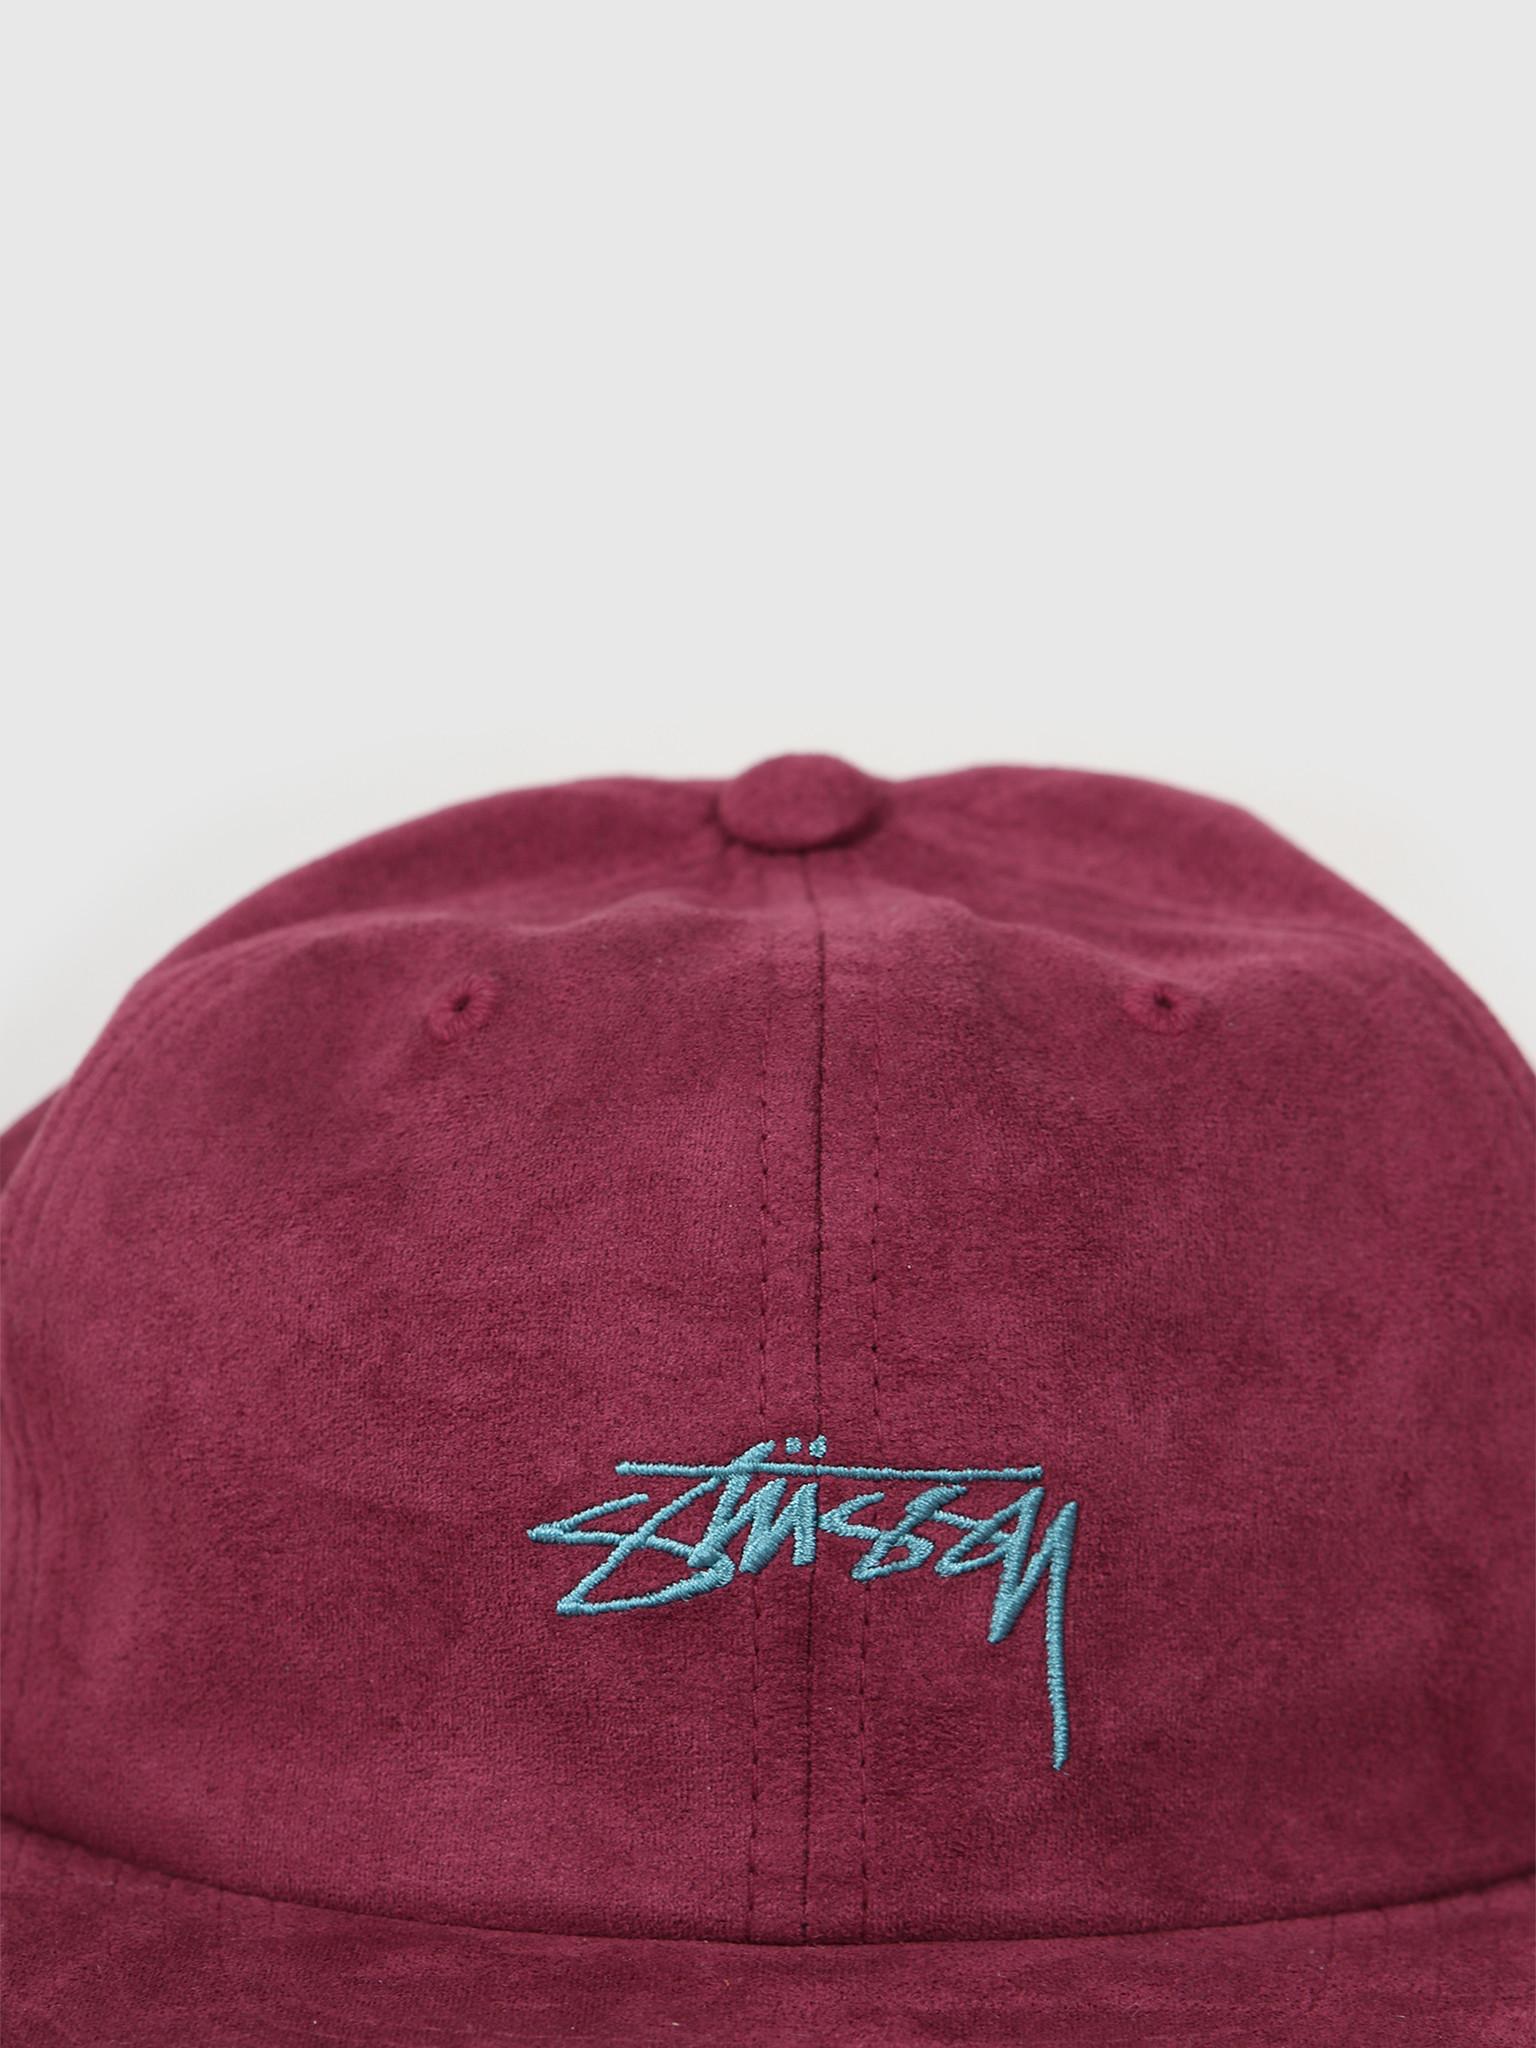 Stussy Stussy Microfiber Cap Burgundy 131920